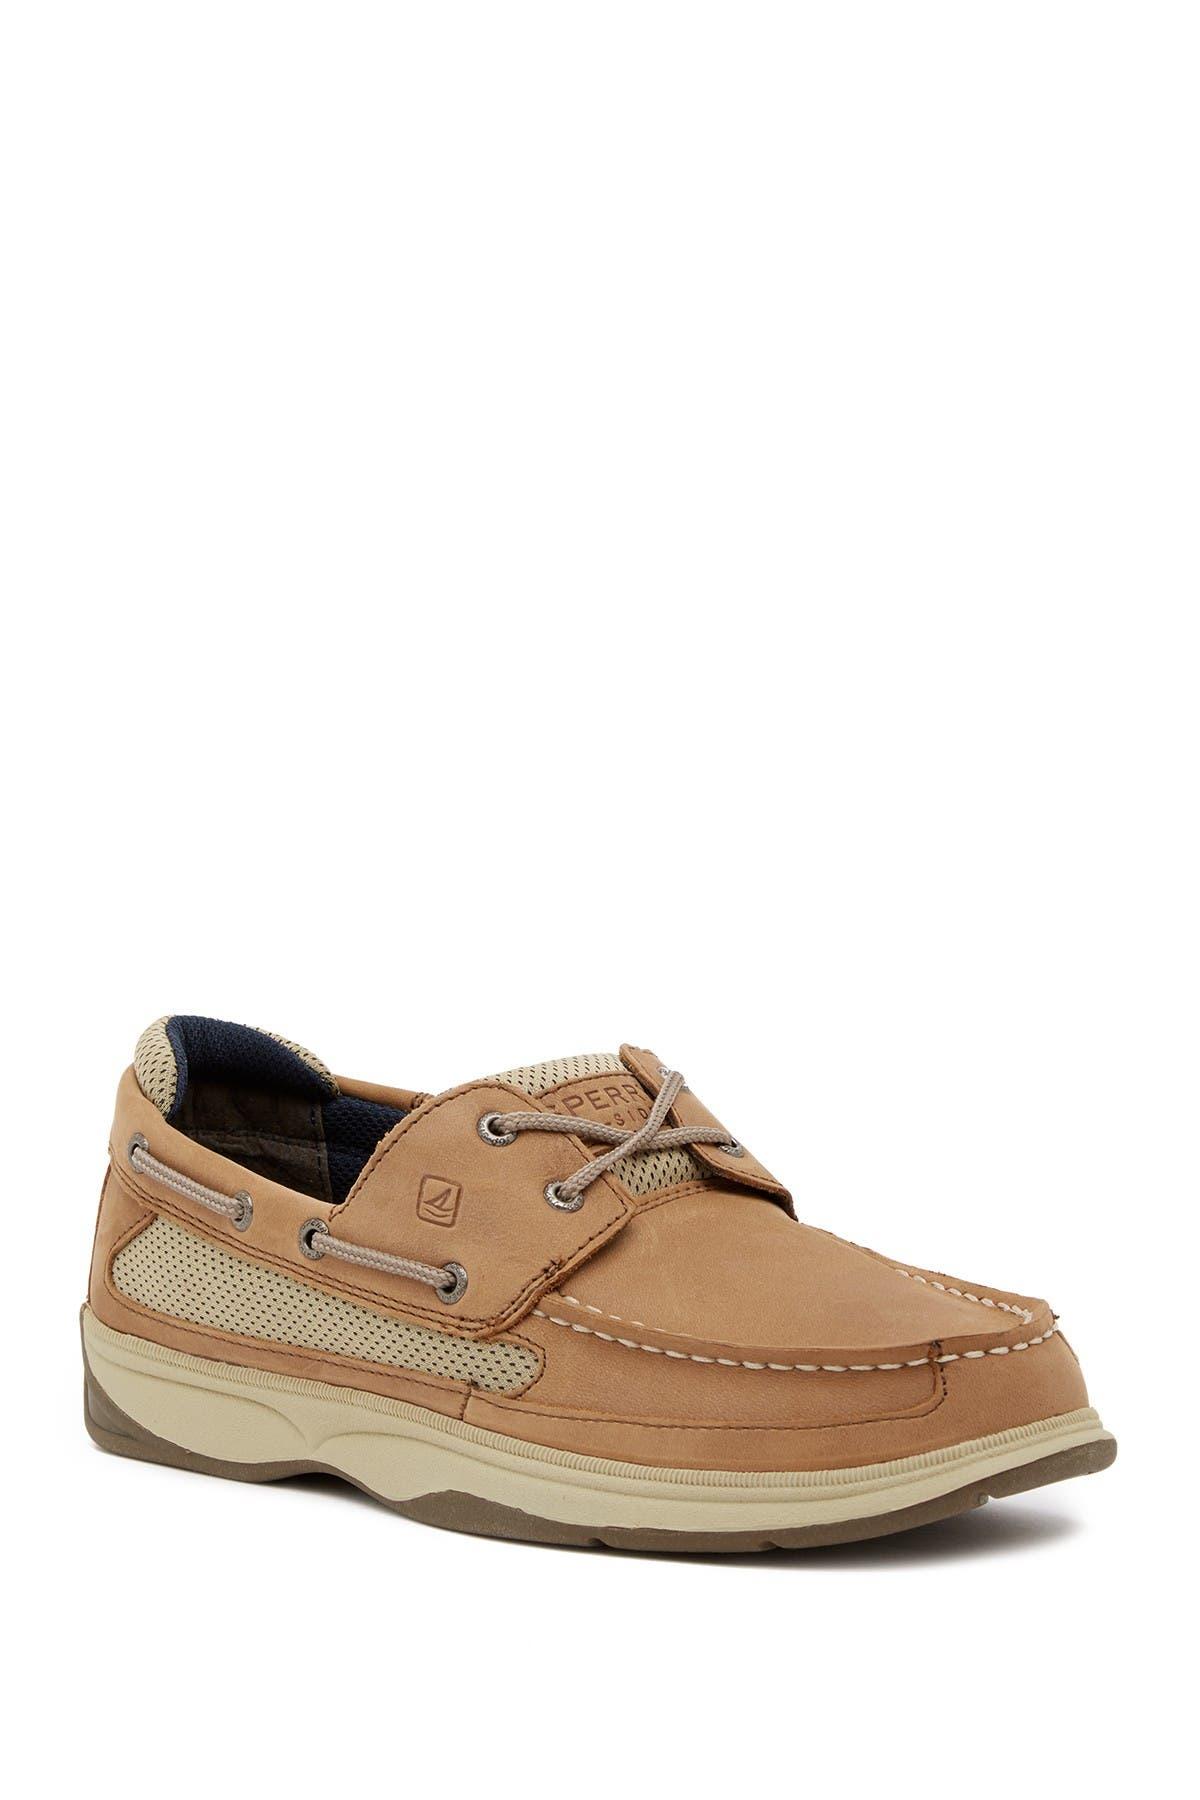 Sperry Kids' Boys' Shoes | Nordstrom Rack